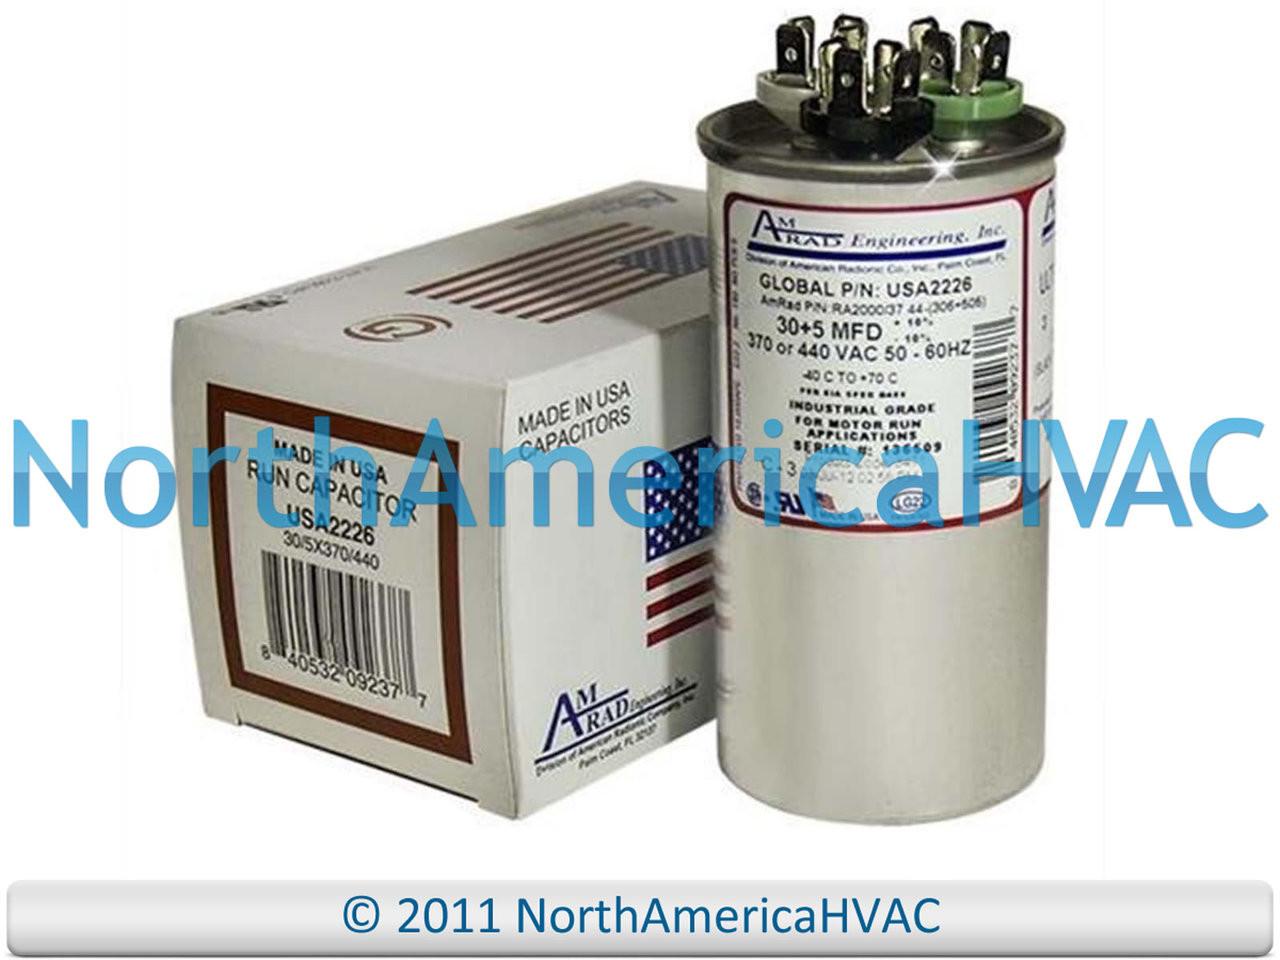 OEM Amrad Run Capacitor 40 440 Volt USA2235 Made in USA! 5 uf MFD 370